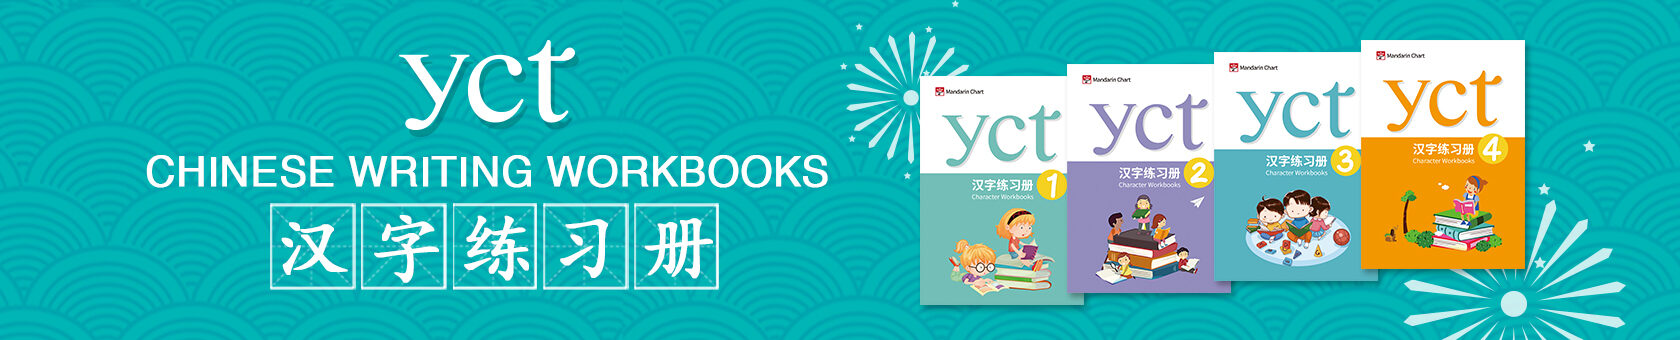 YCT Chinese Writing Workbooks